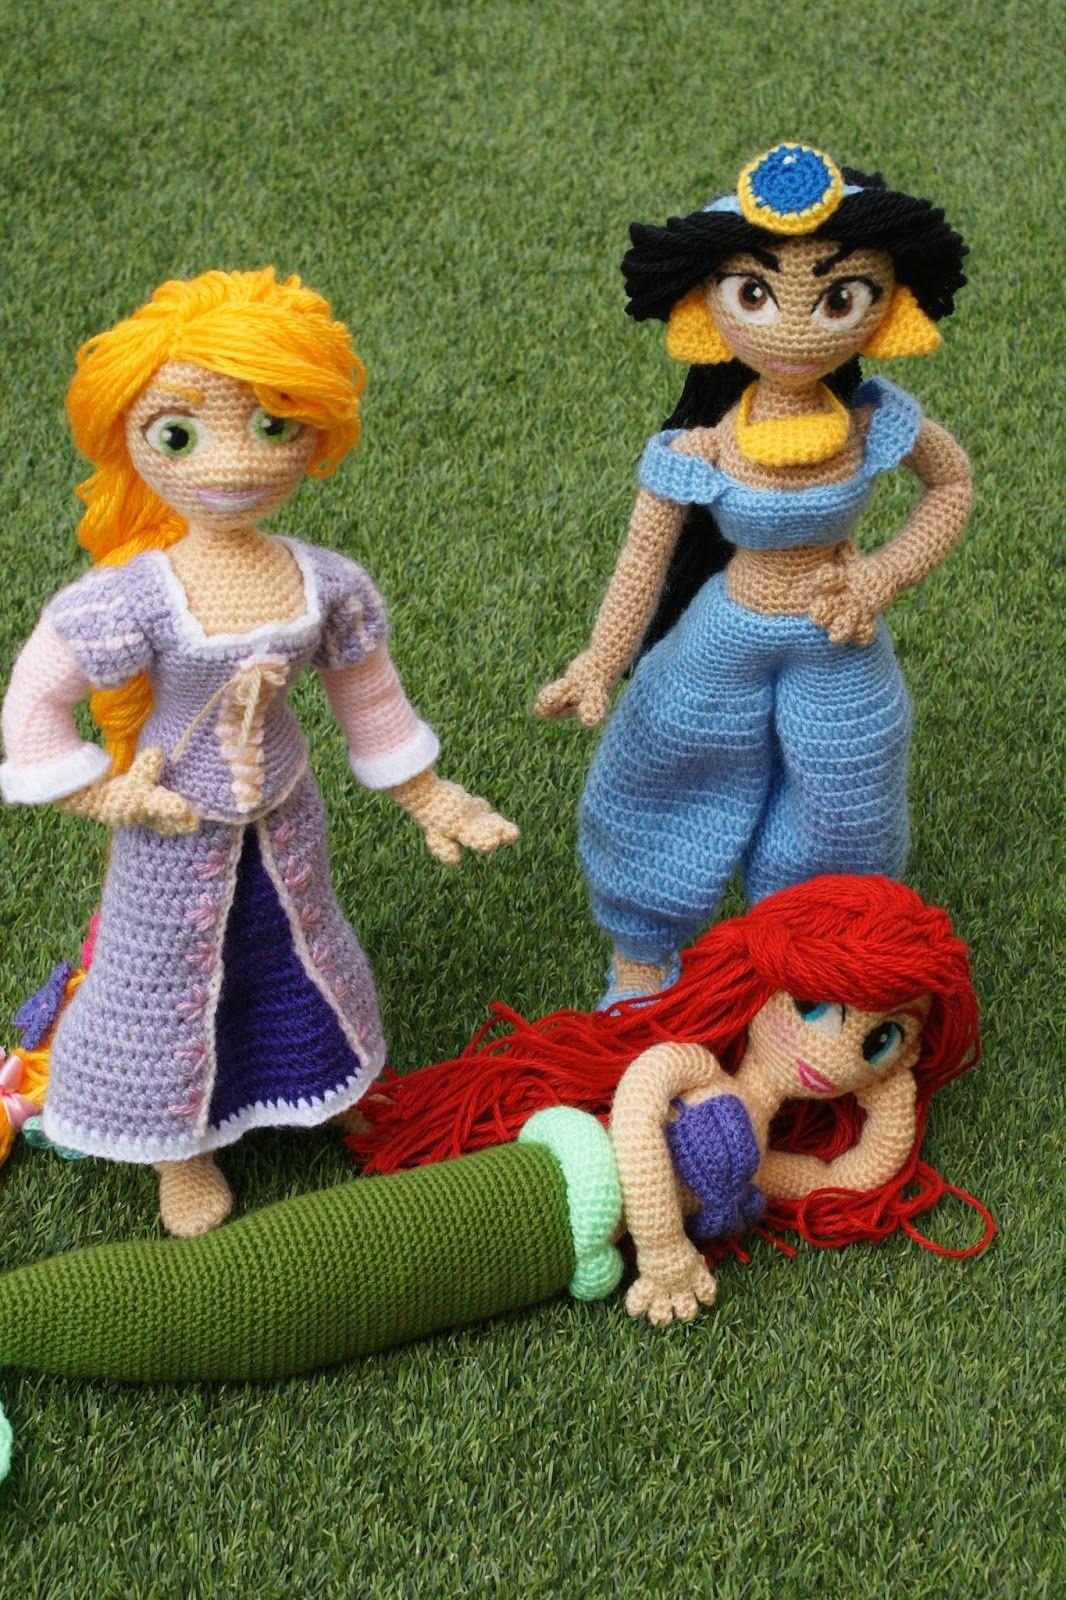 Receita Princesa Rapunzel Amigurumi | Rapunzel, Receitas amigurumi ... | 1600x1066